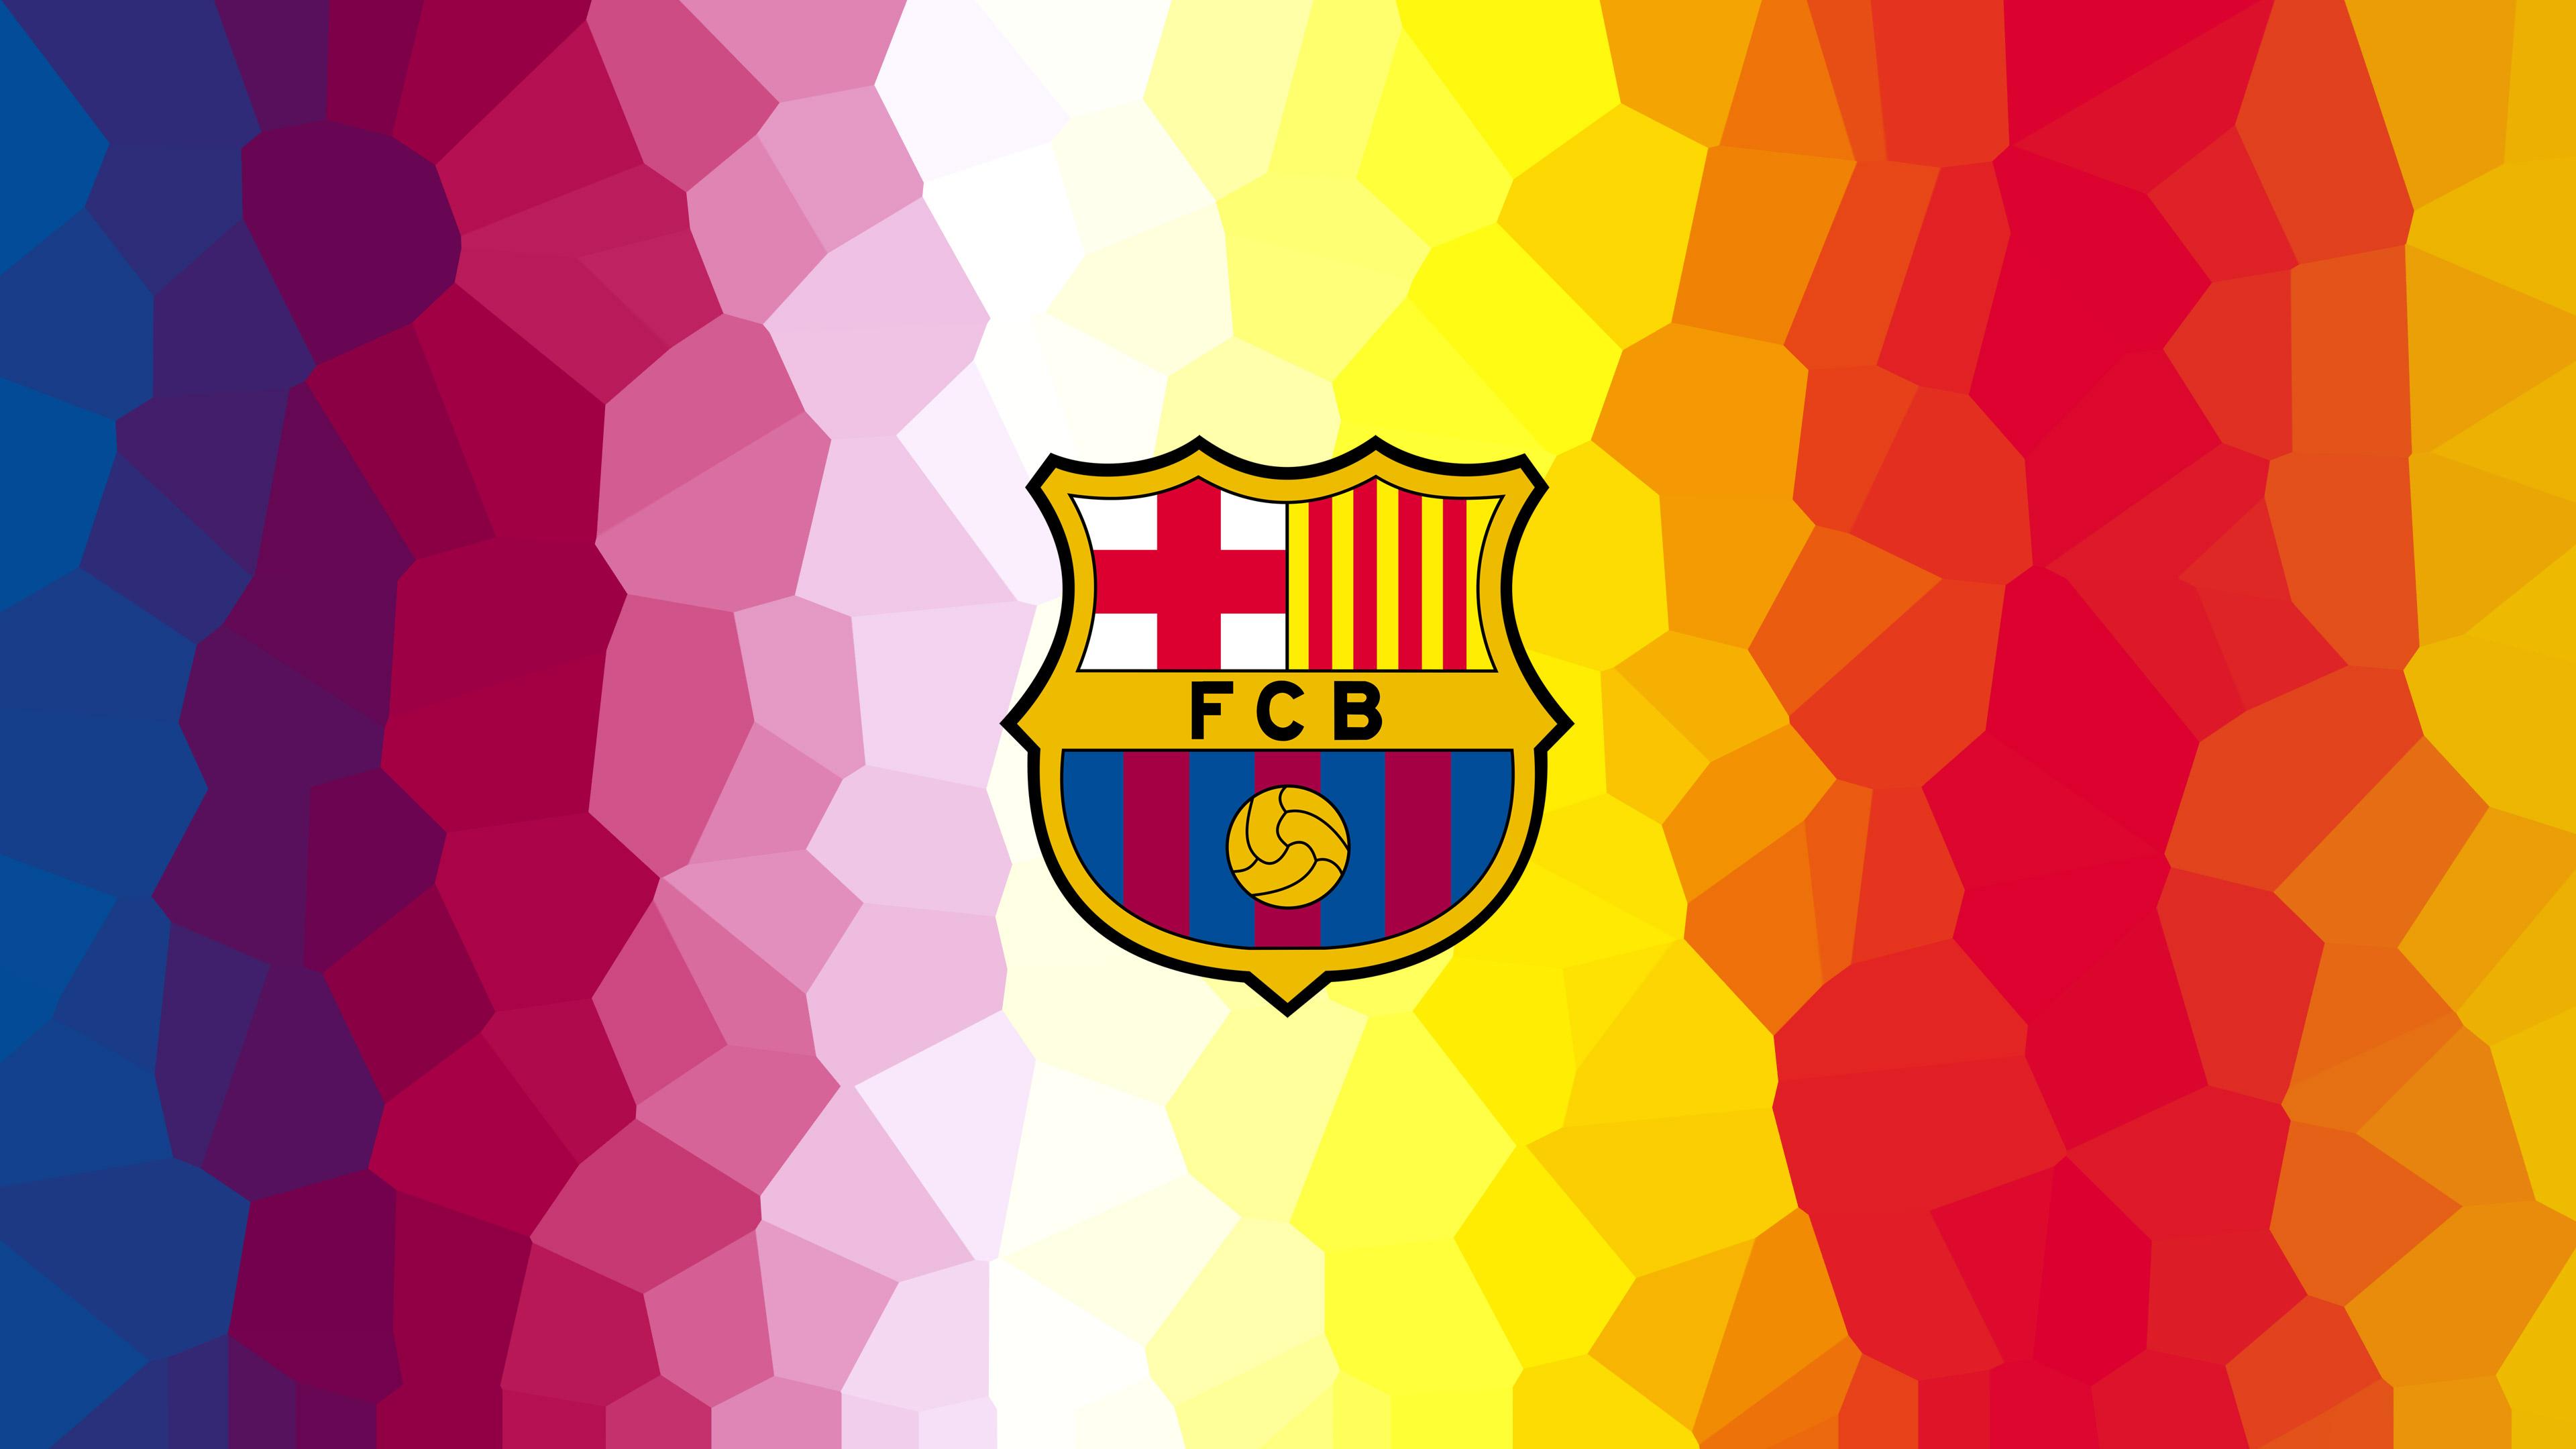 Soccer ps4wallpapers fc barcelona minimalism logo biocorpaavc